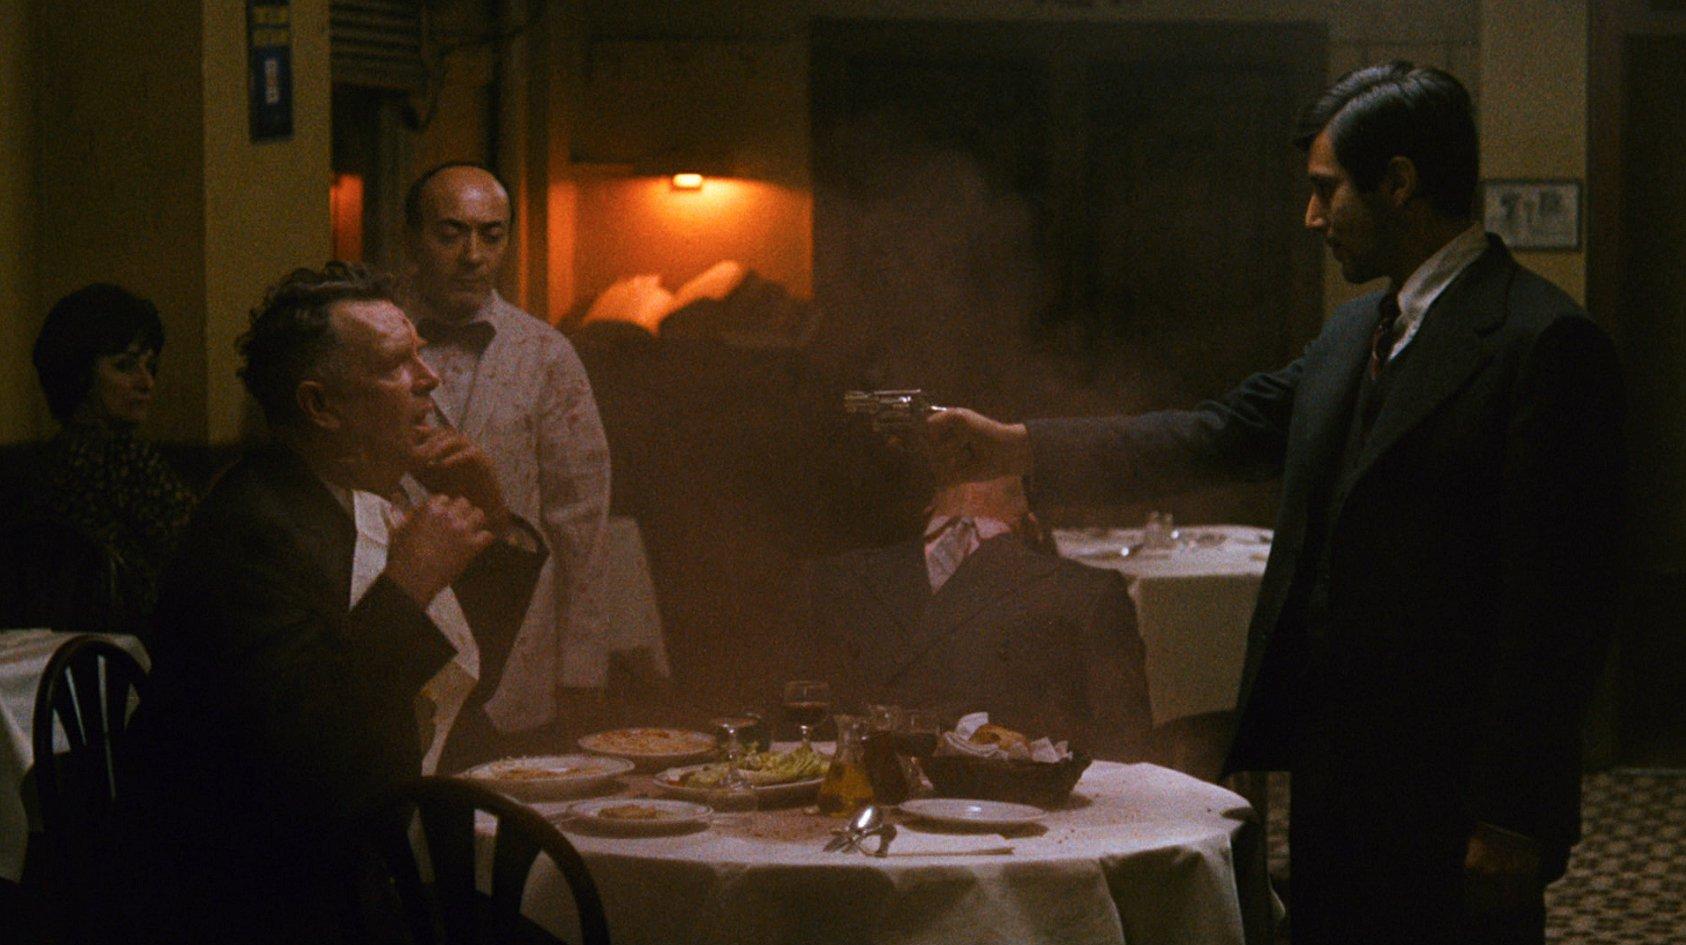 5. Крестный отец The Godfather (1972), оператор Гордон Уиллис (Фрэнсис Форд Коппола)